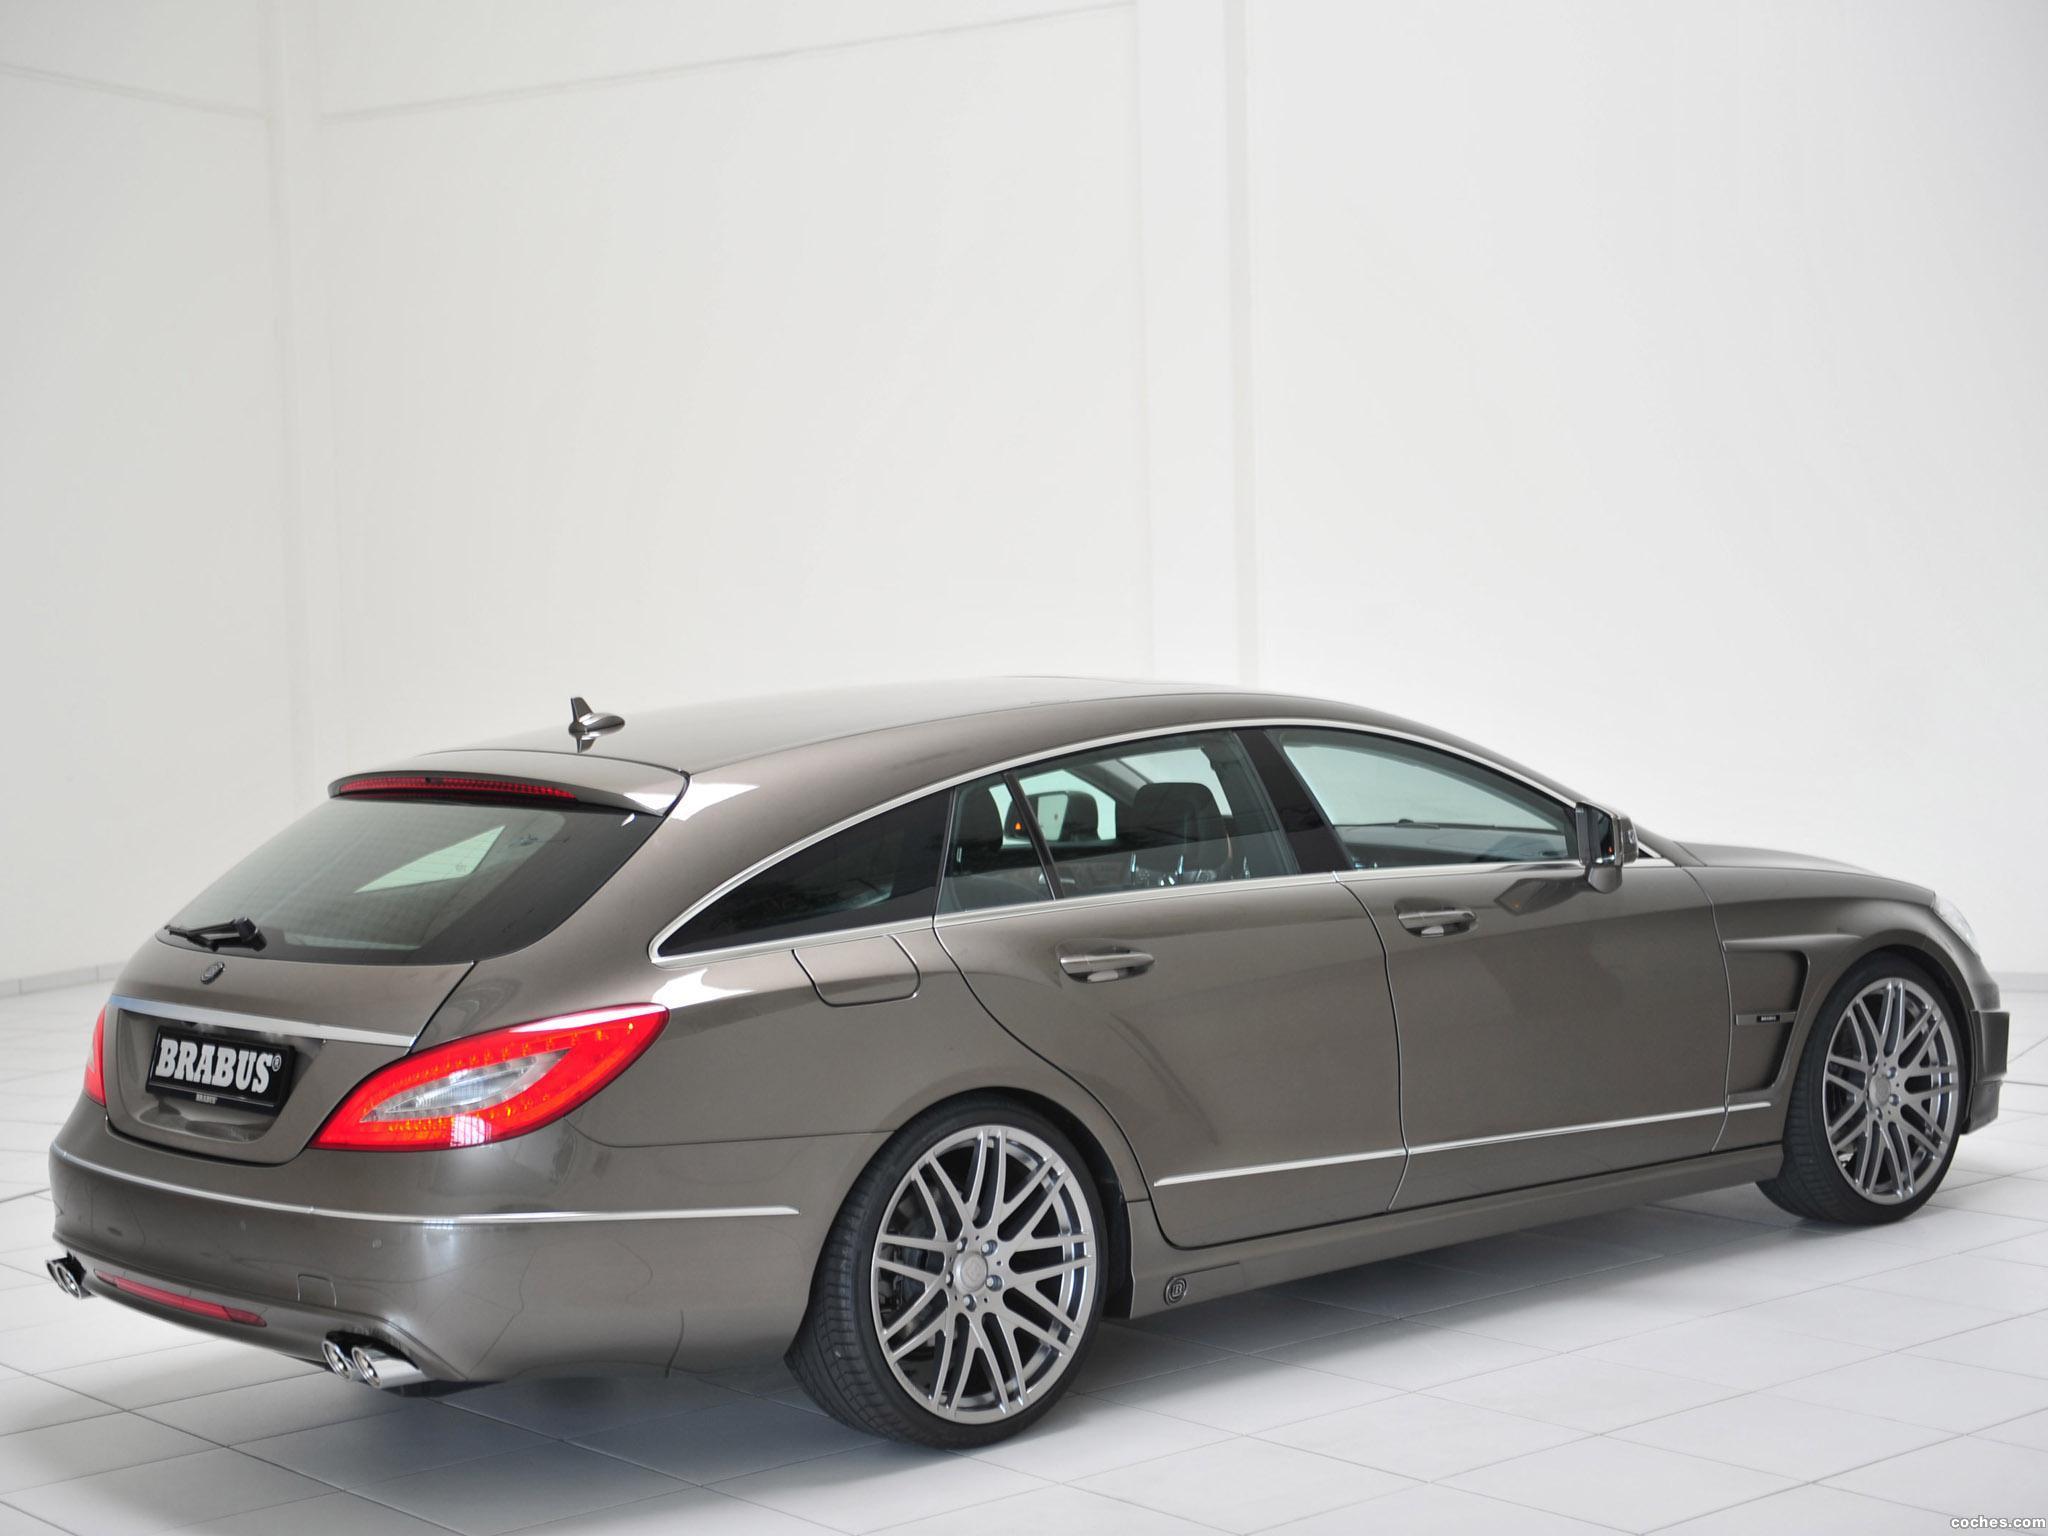 Foto 5 de Mercedes Brabus CLS Shooting Brake X218 2012